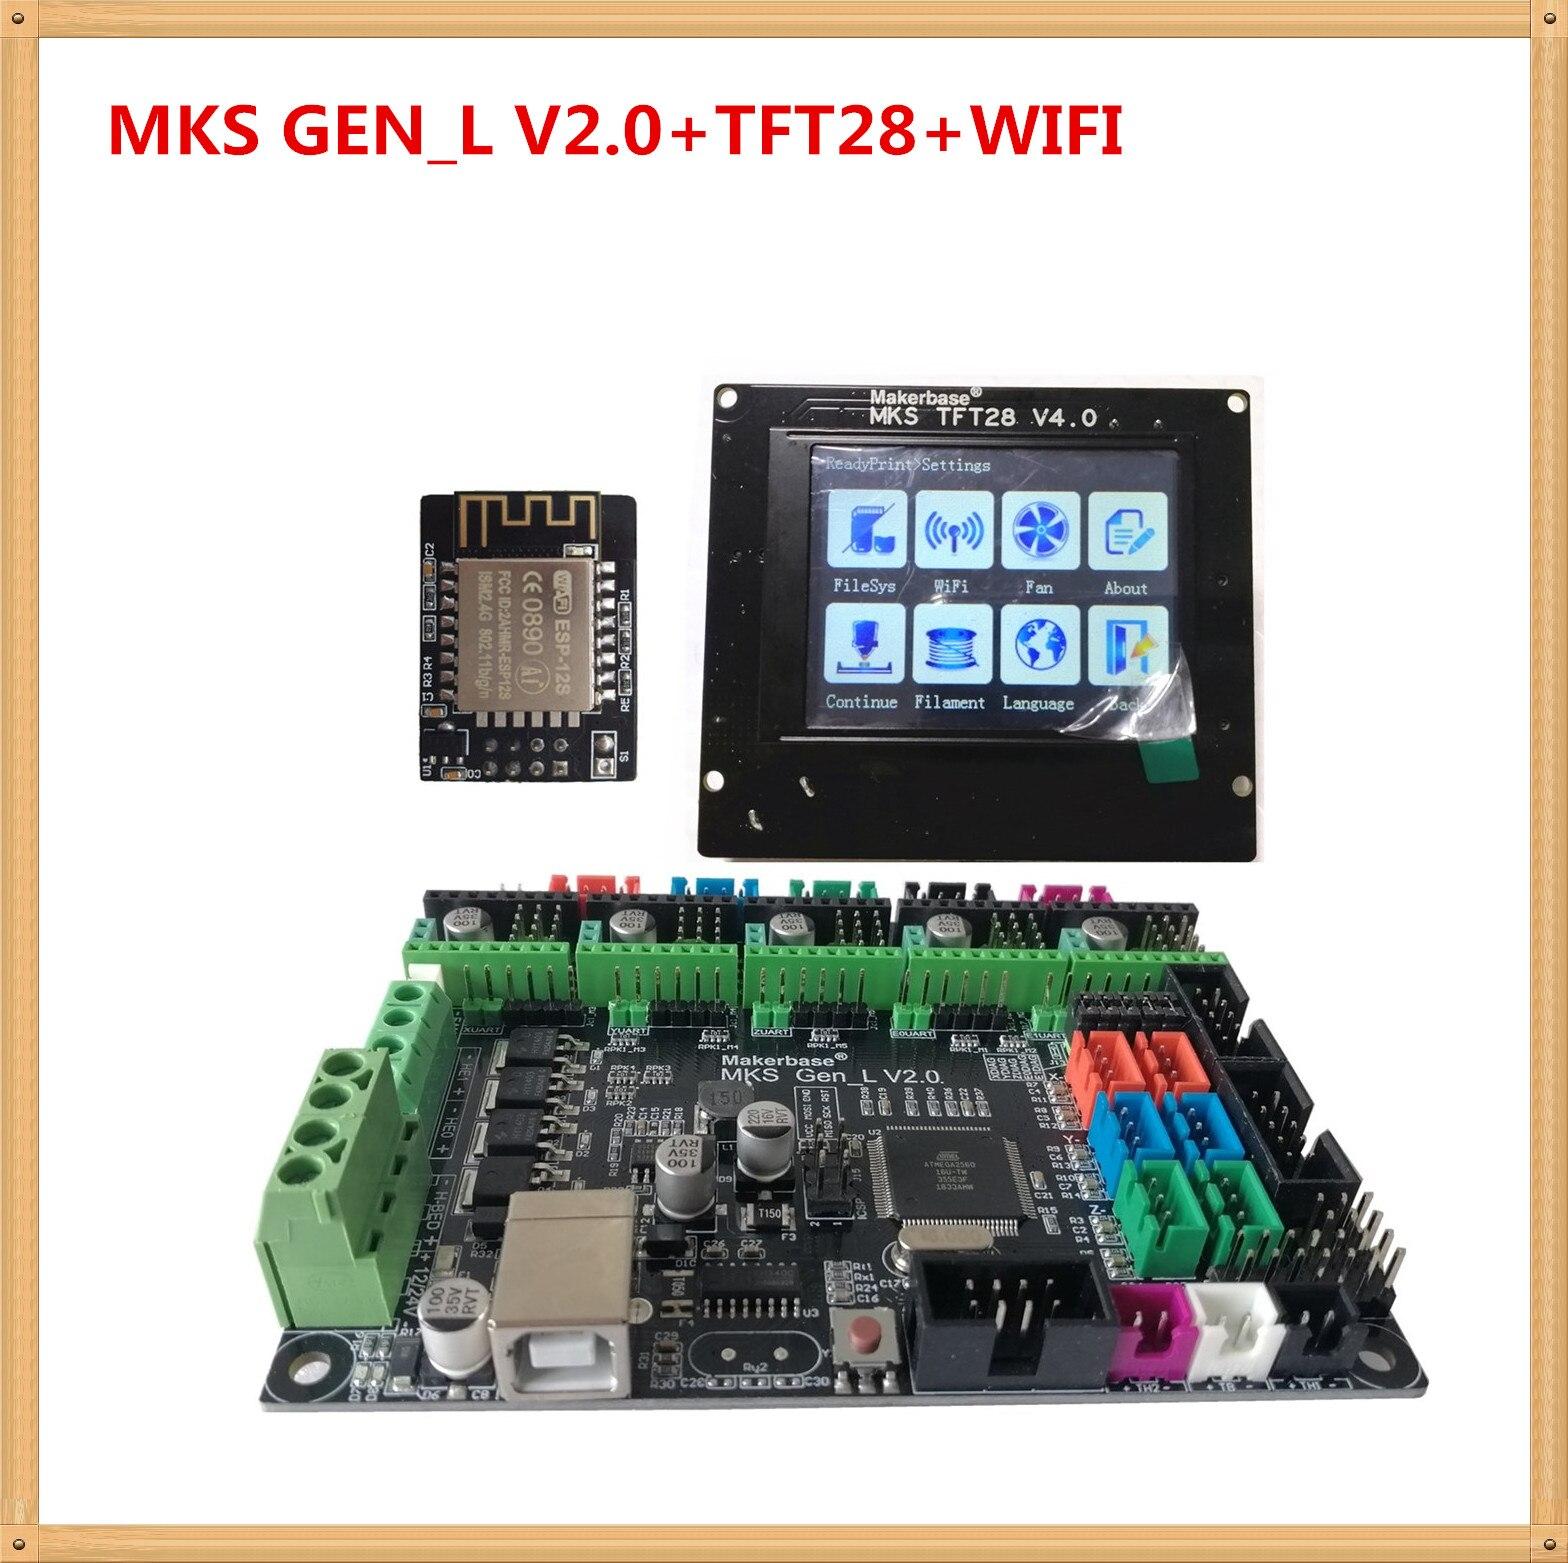 MKS GEN L V2.0 + MKS TFT28 pantalla en color minipanel pantalla táctil barato 3D impresión kits escolares controlador 3d impresora starter unidad